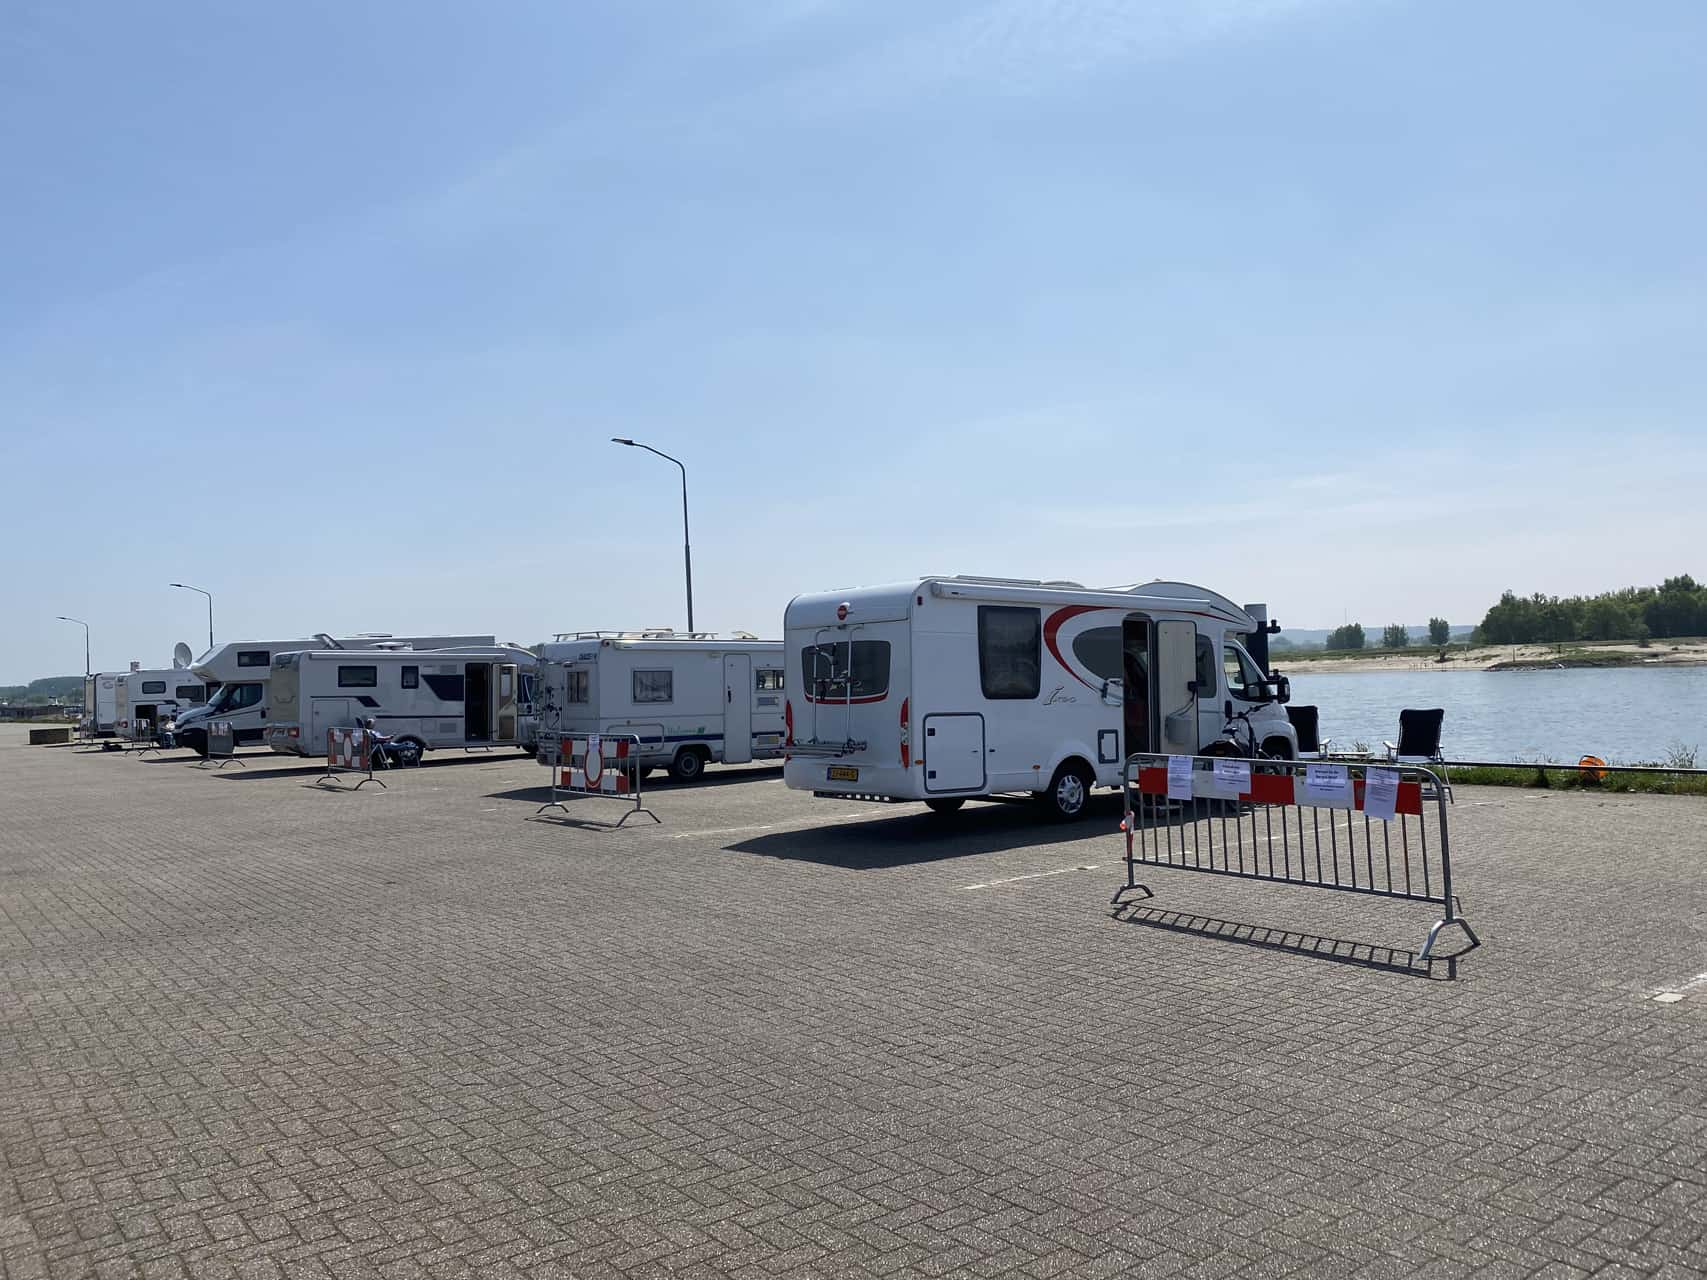 camperplaats geopend